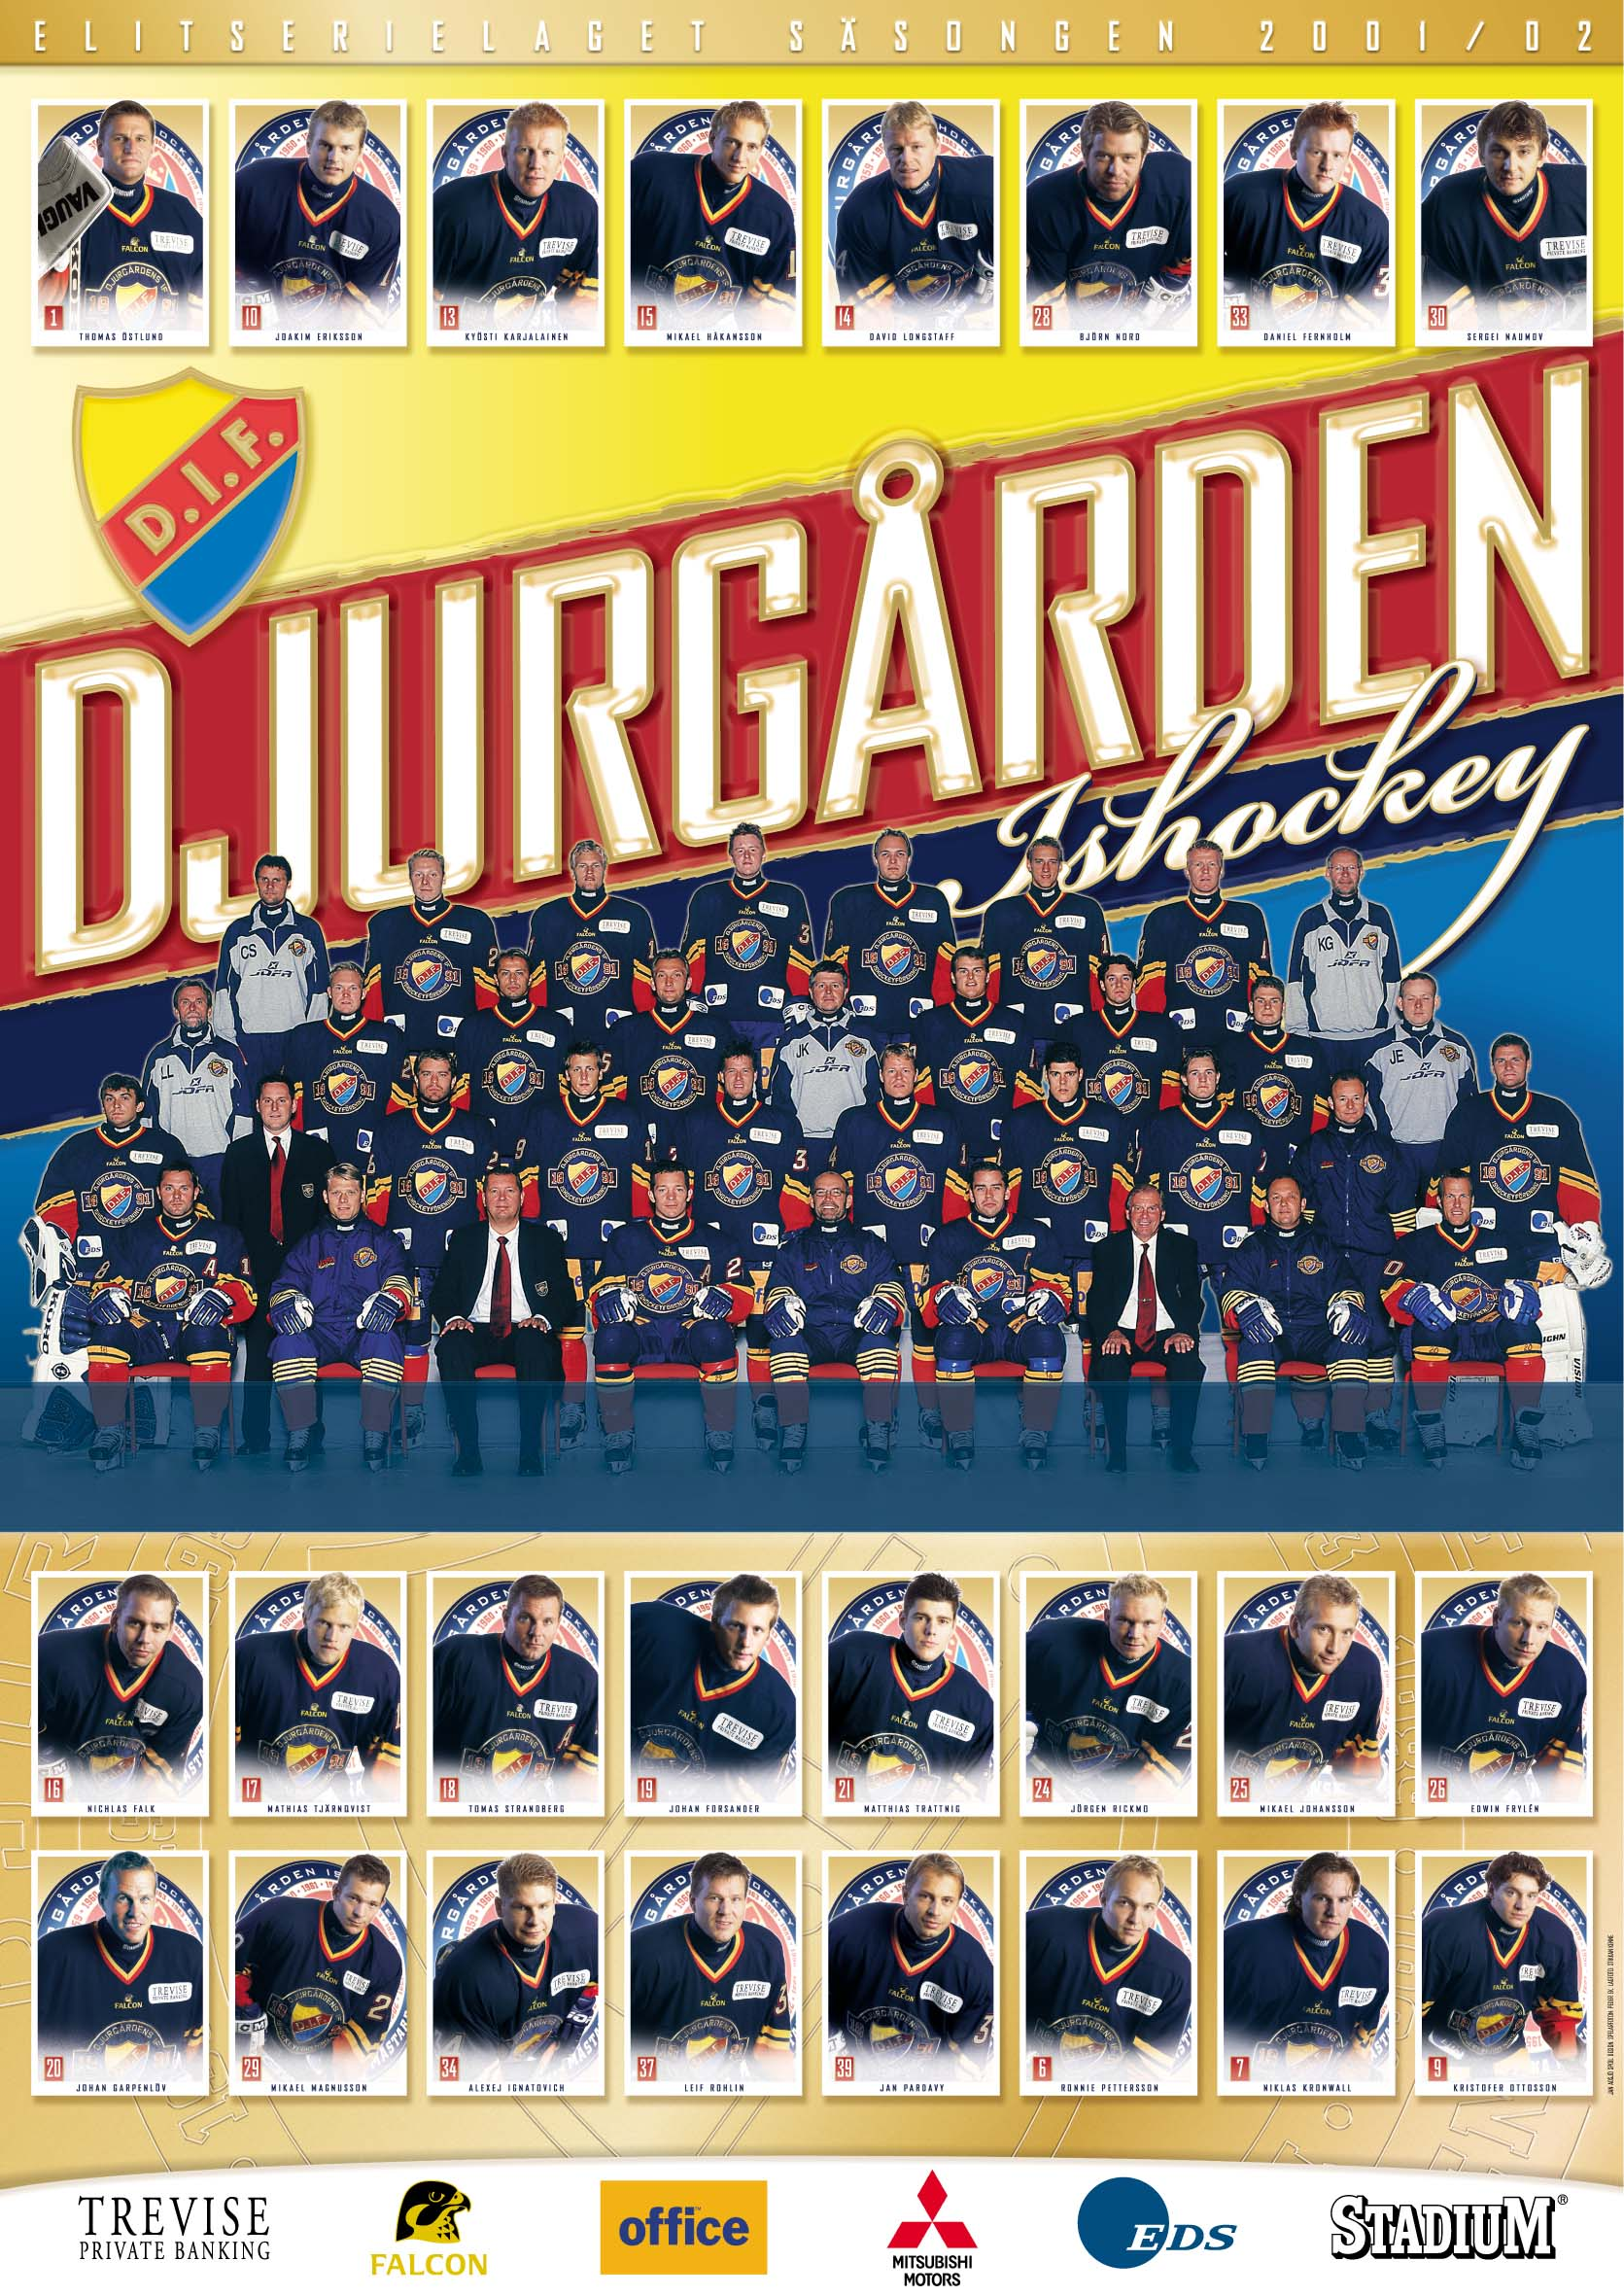 Djurgården Ishockey